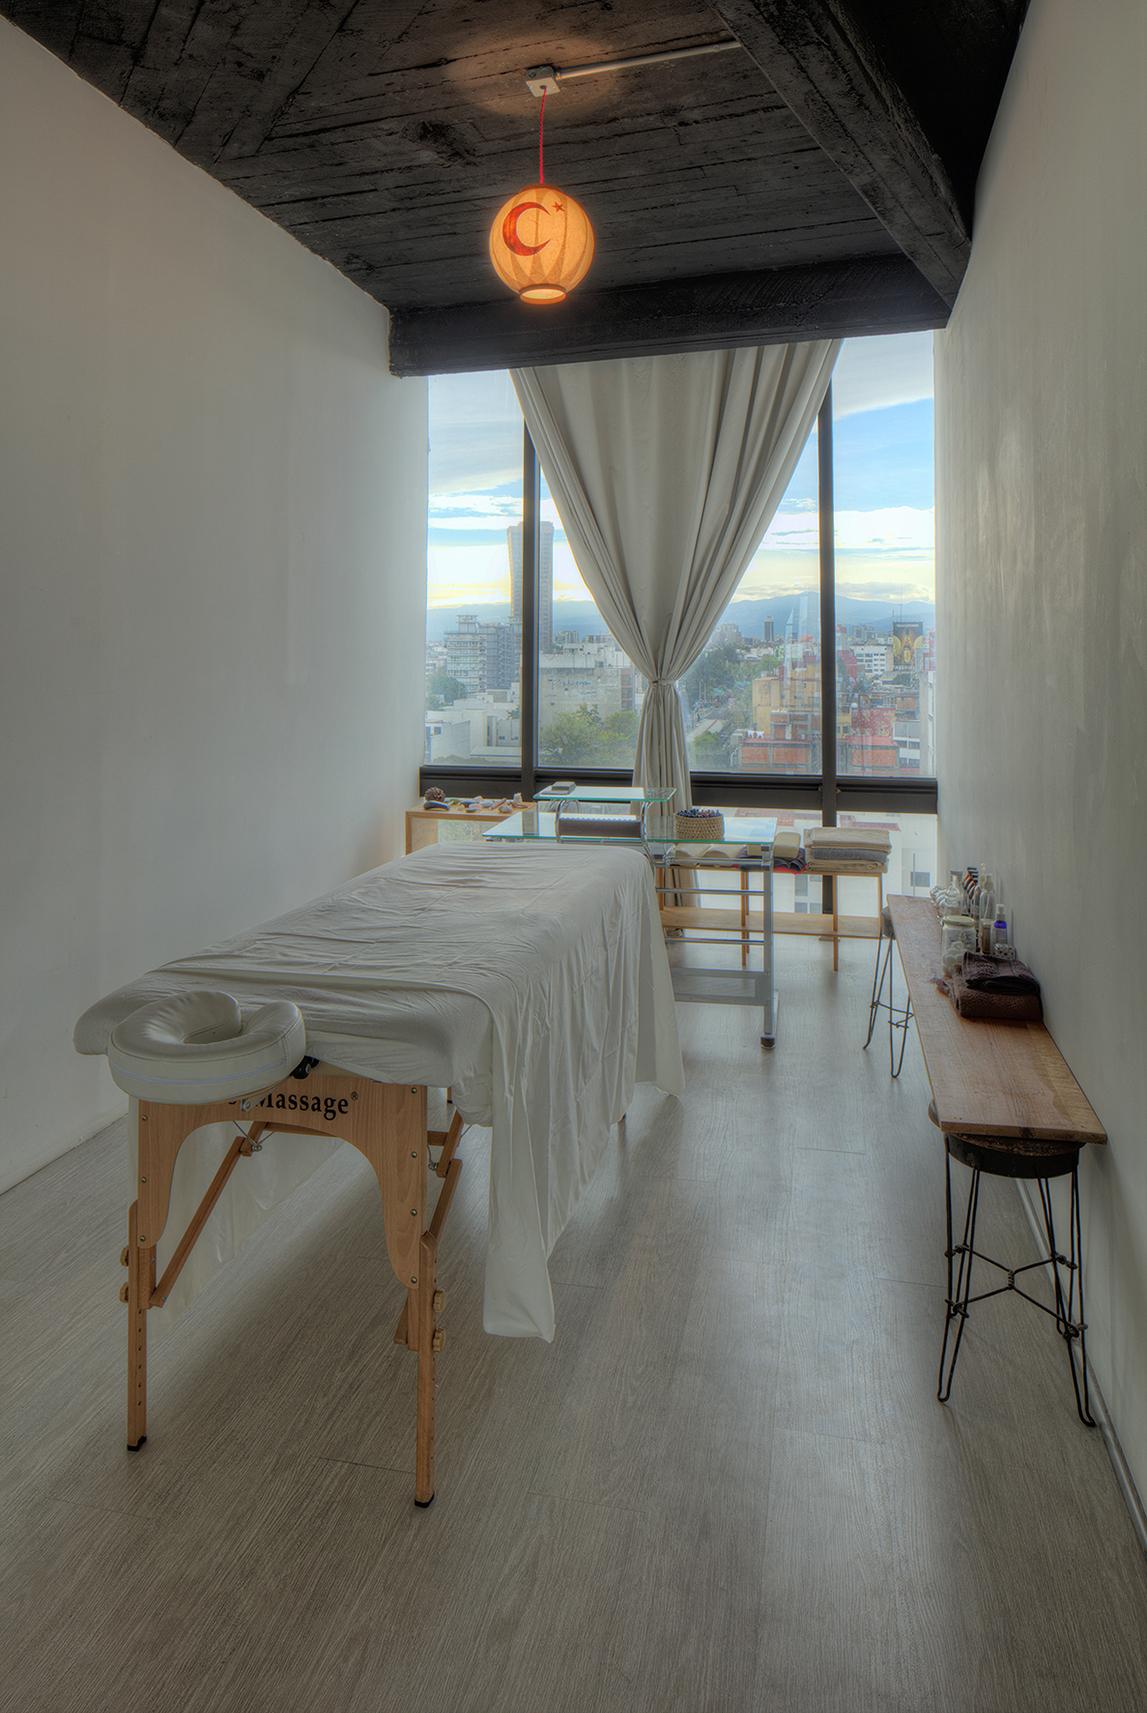 medicina tradicional, acupuntura, hipnosis, flores de bach, masaje terapéutico